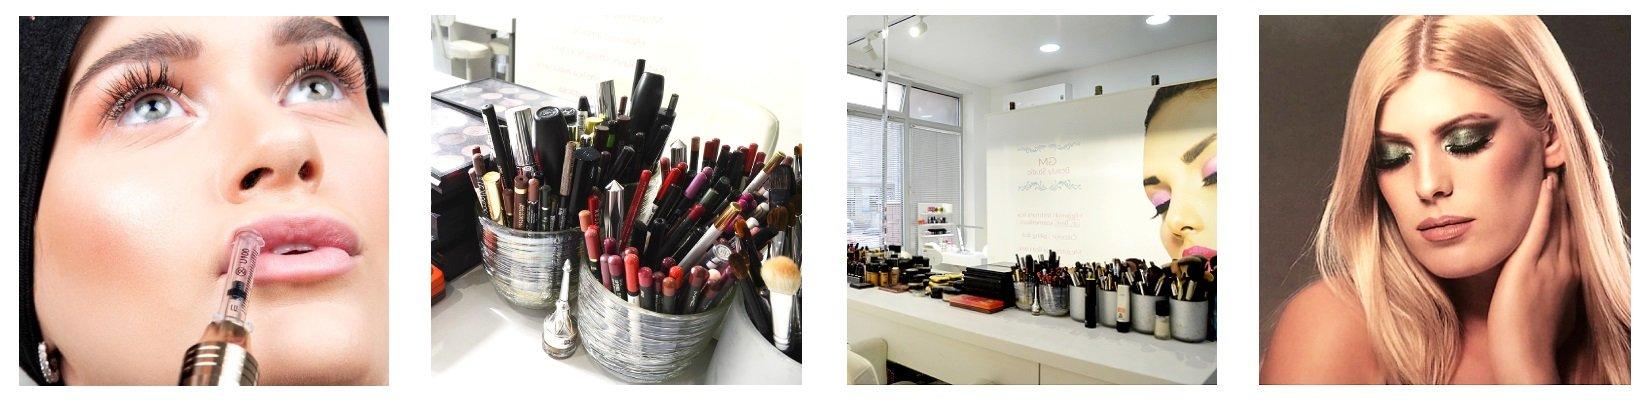 Gm beauty studio